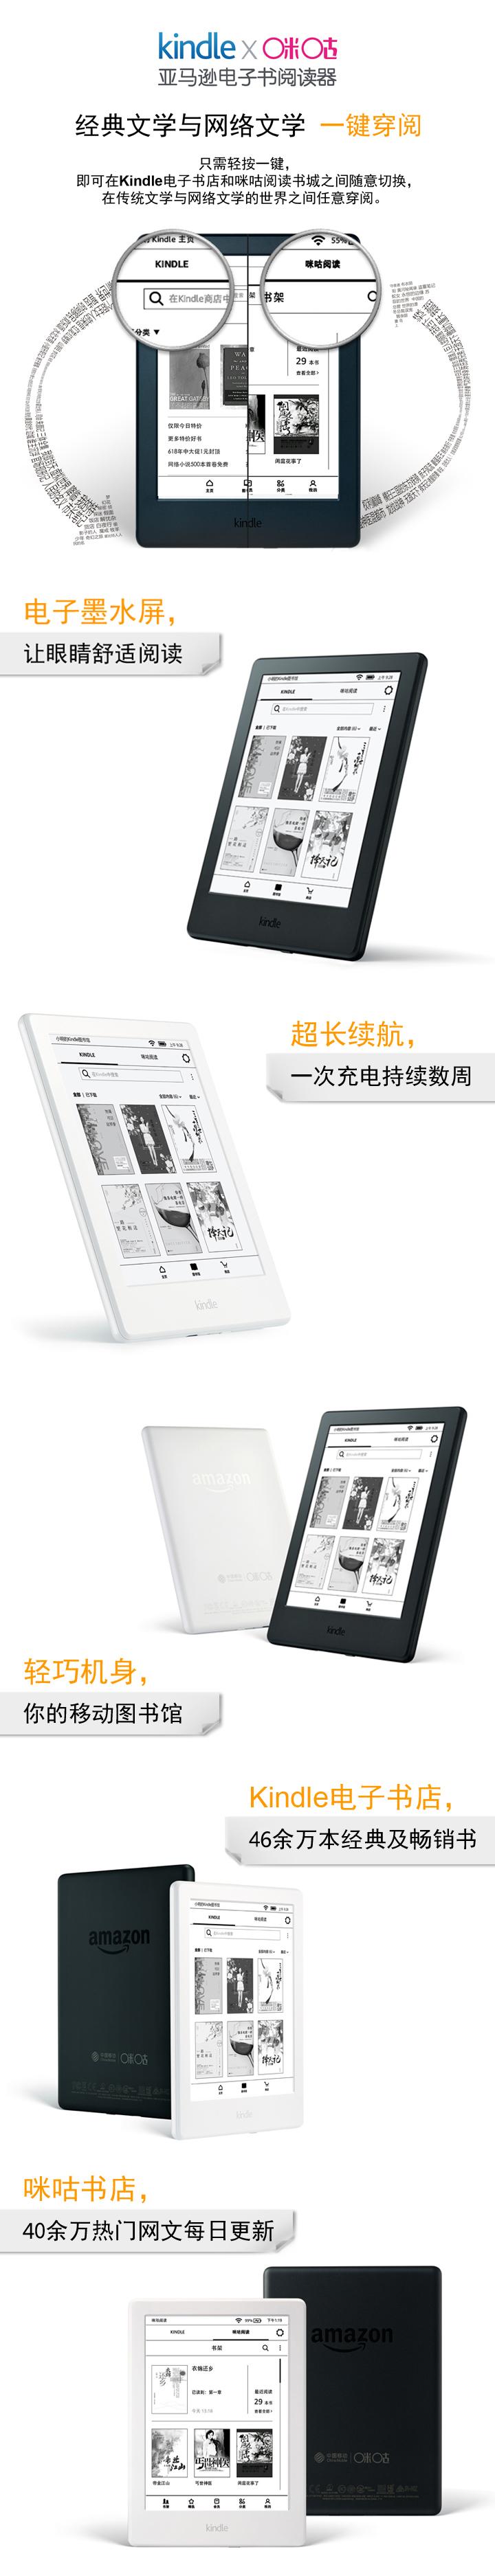 Kindle×咪咕电子书阅读器免费试用,评测